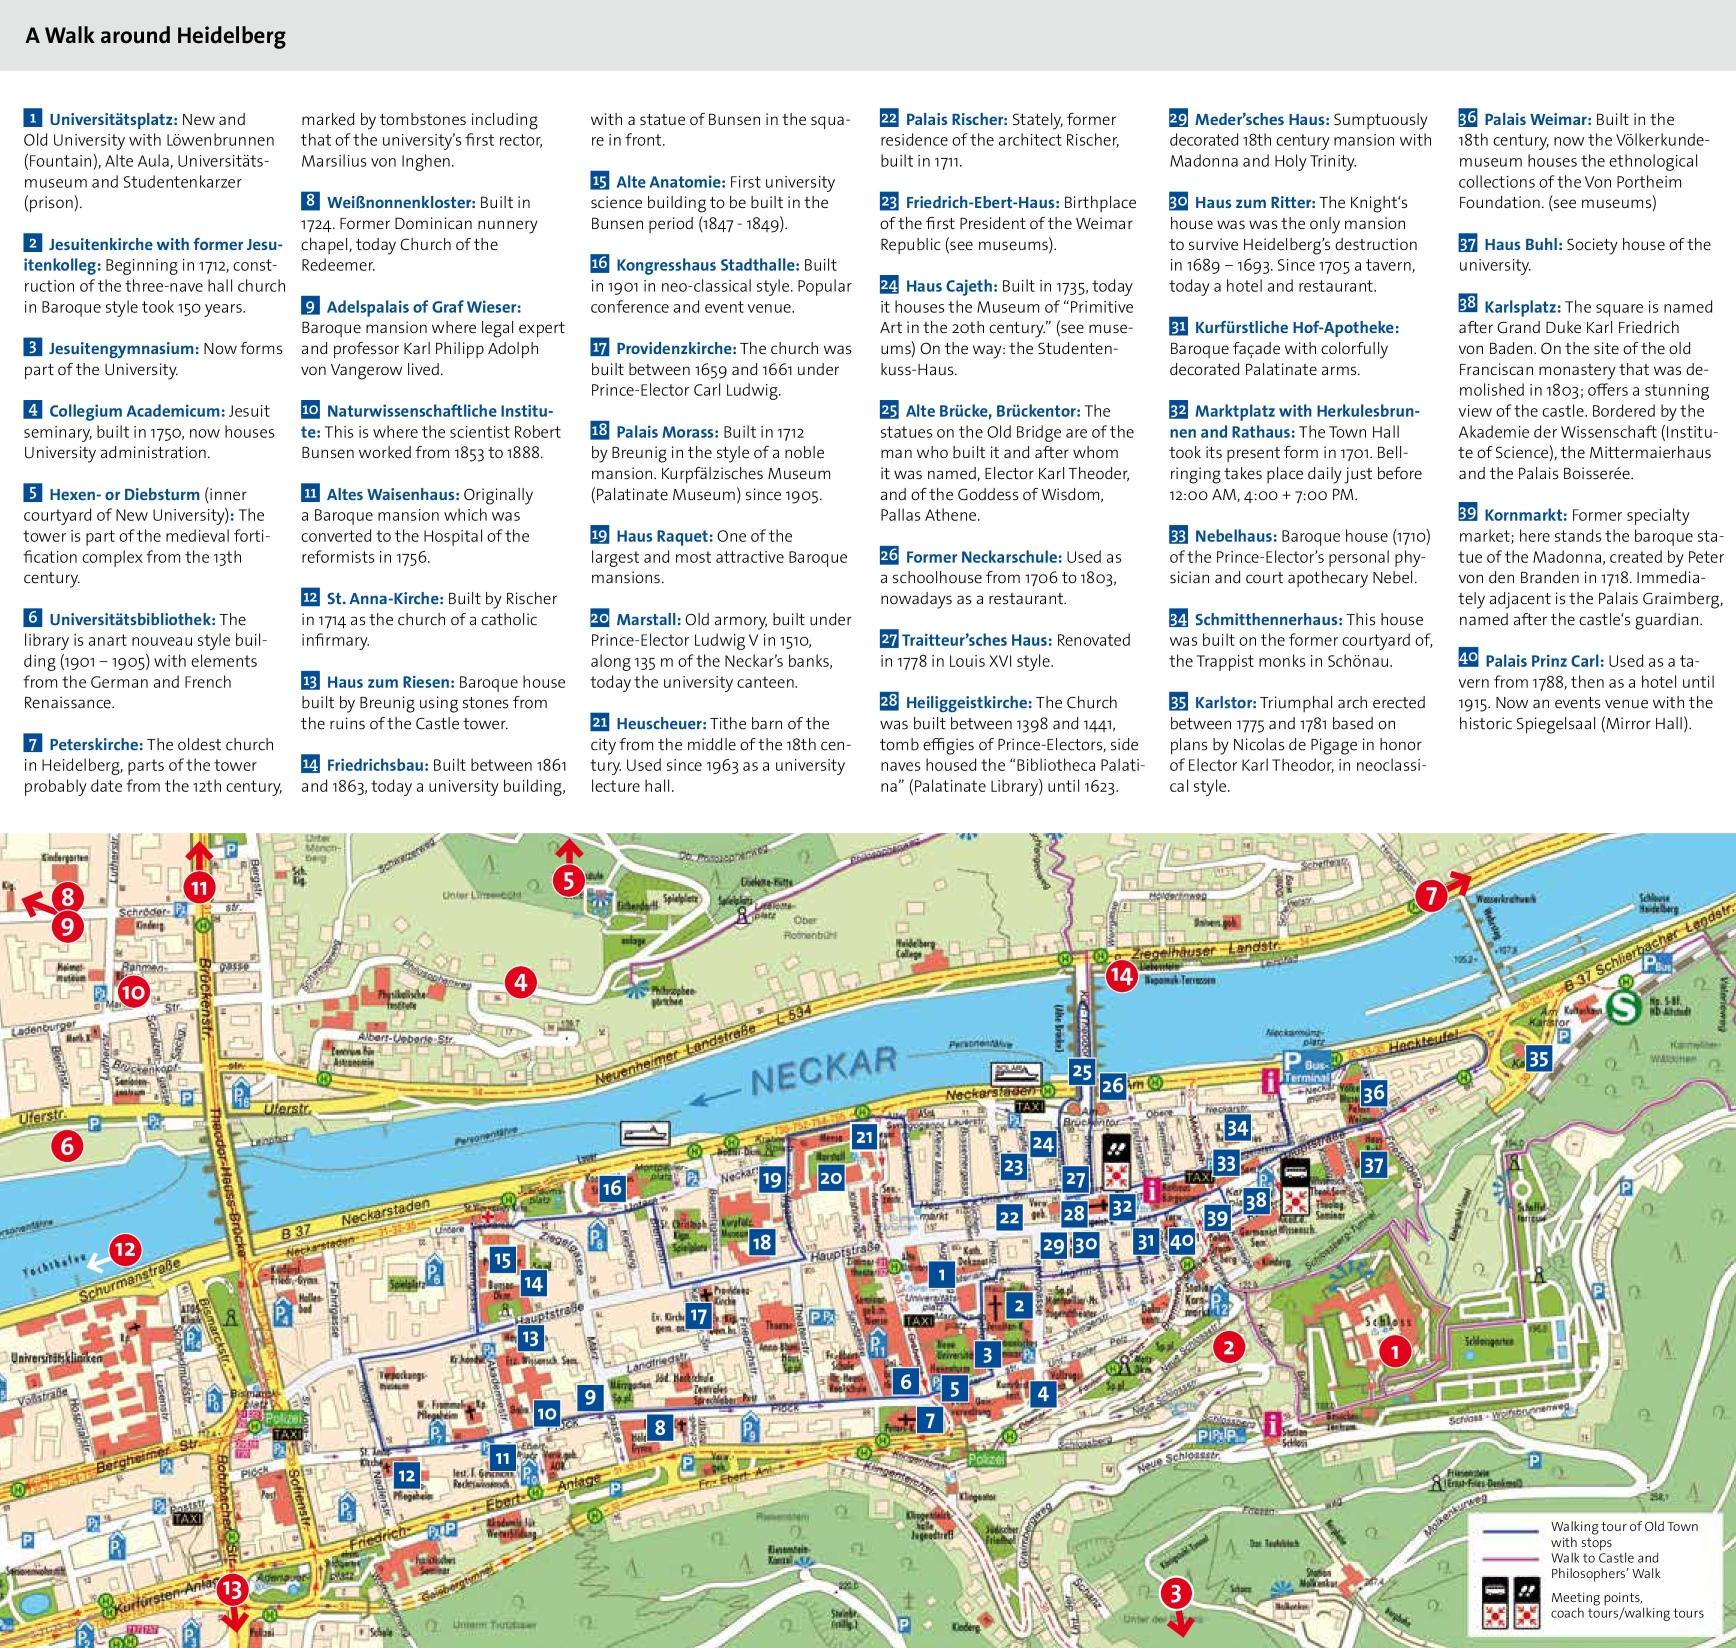 heidelberg mapa Heidelberg Maps | Germany | Maps of Heidelberg heidelberg mapa